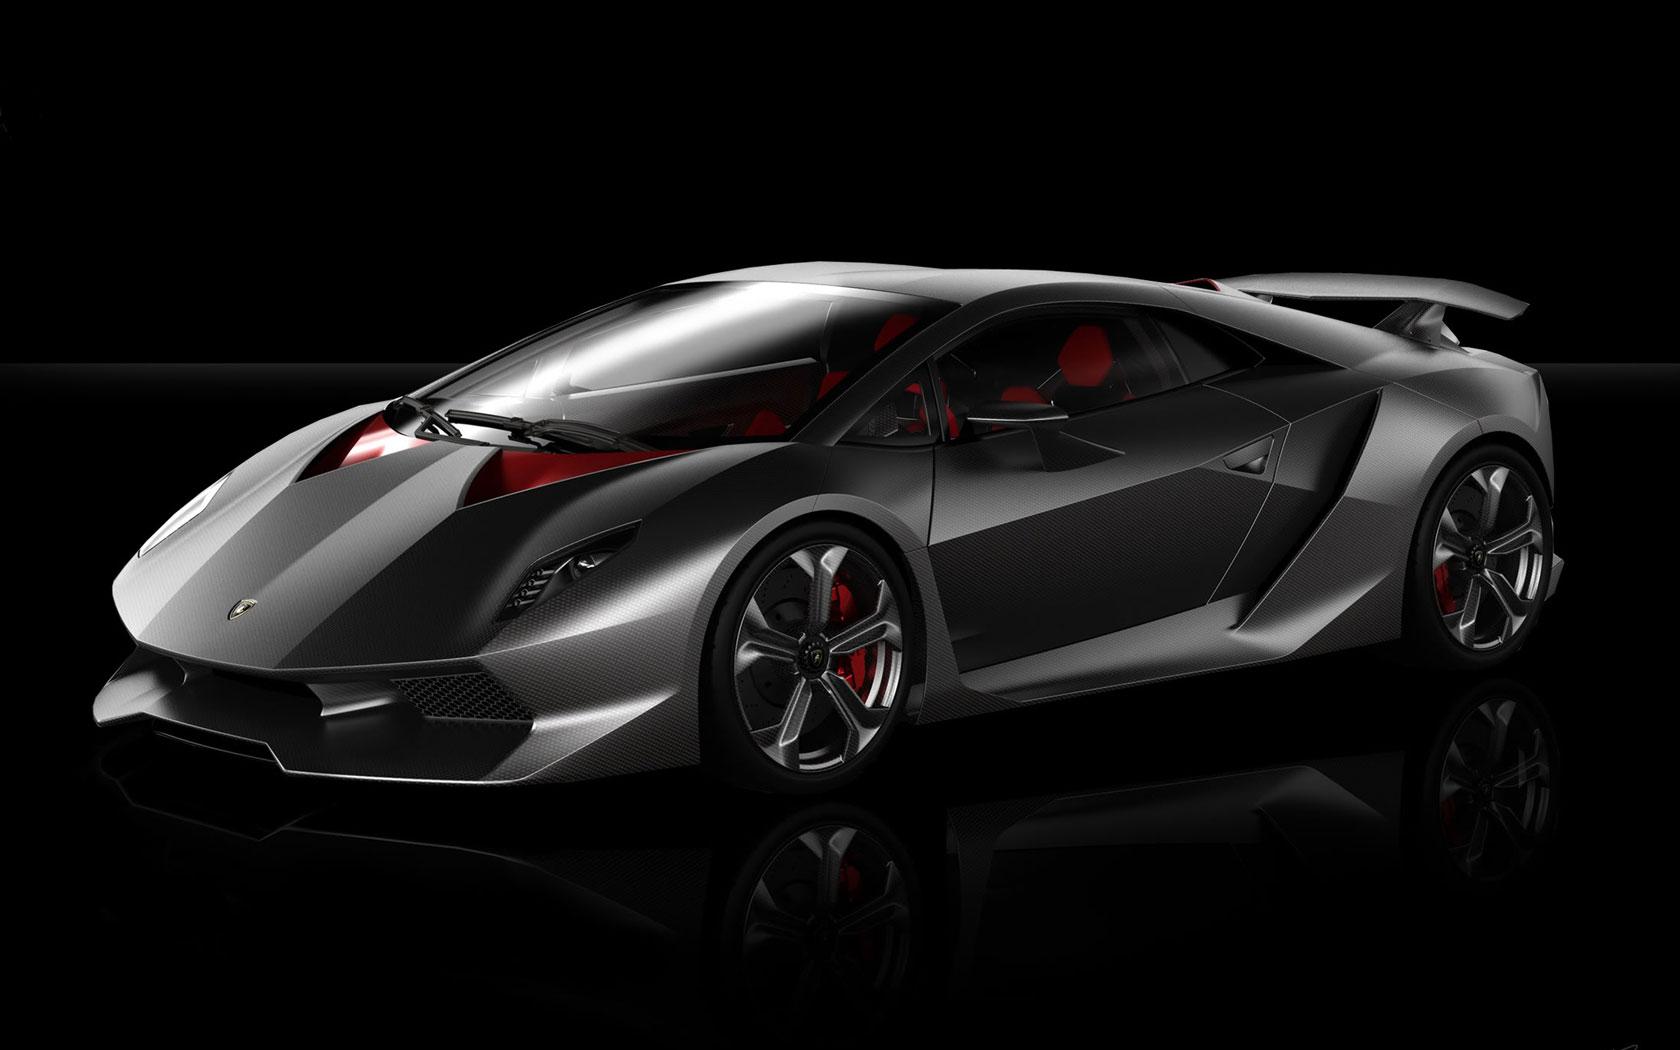 Most Viewed Lamborghini Sesto Elemento Wallpapers 4k Wallpapers